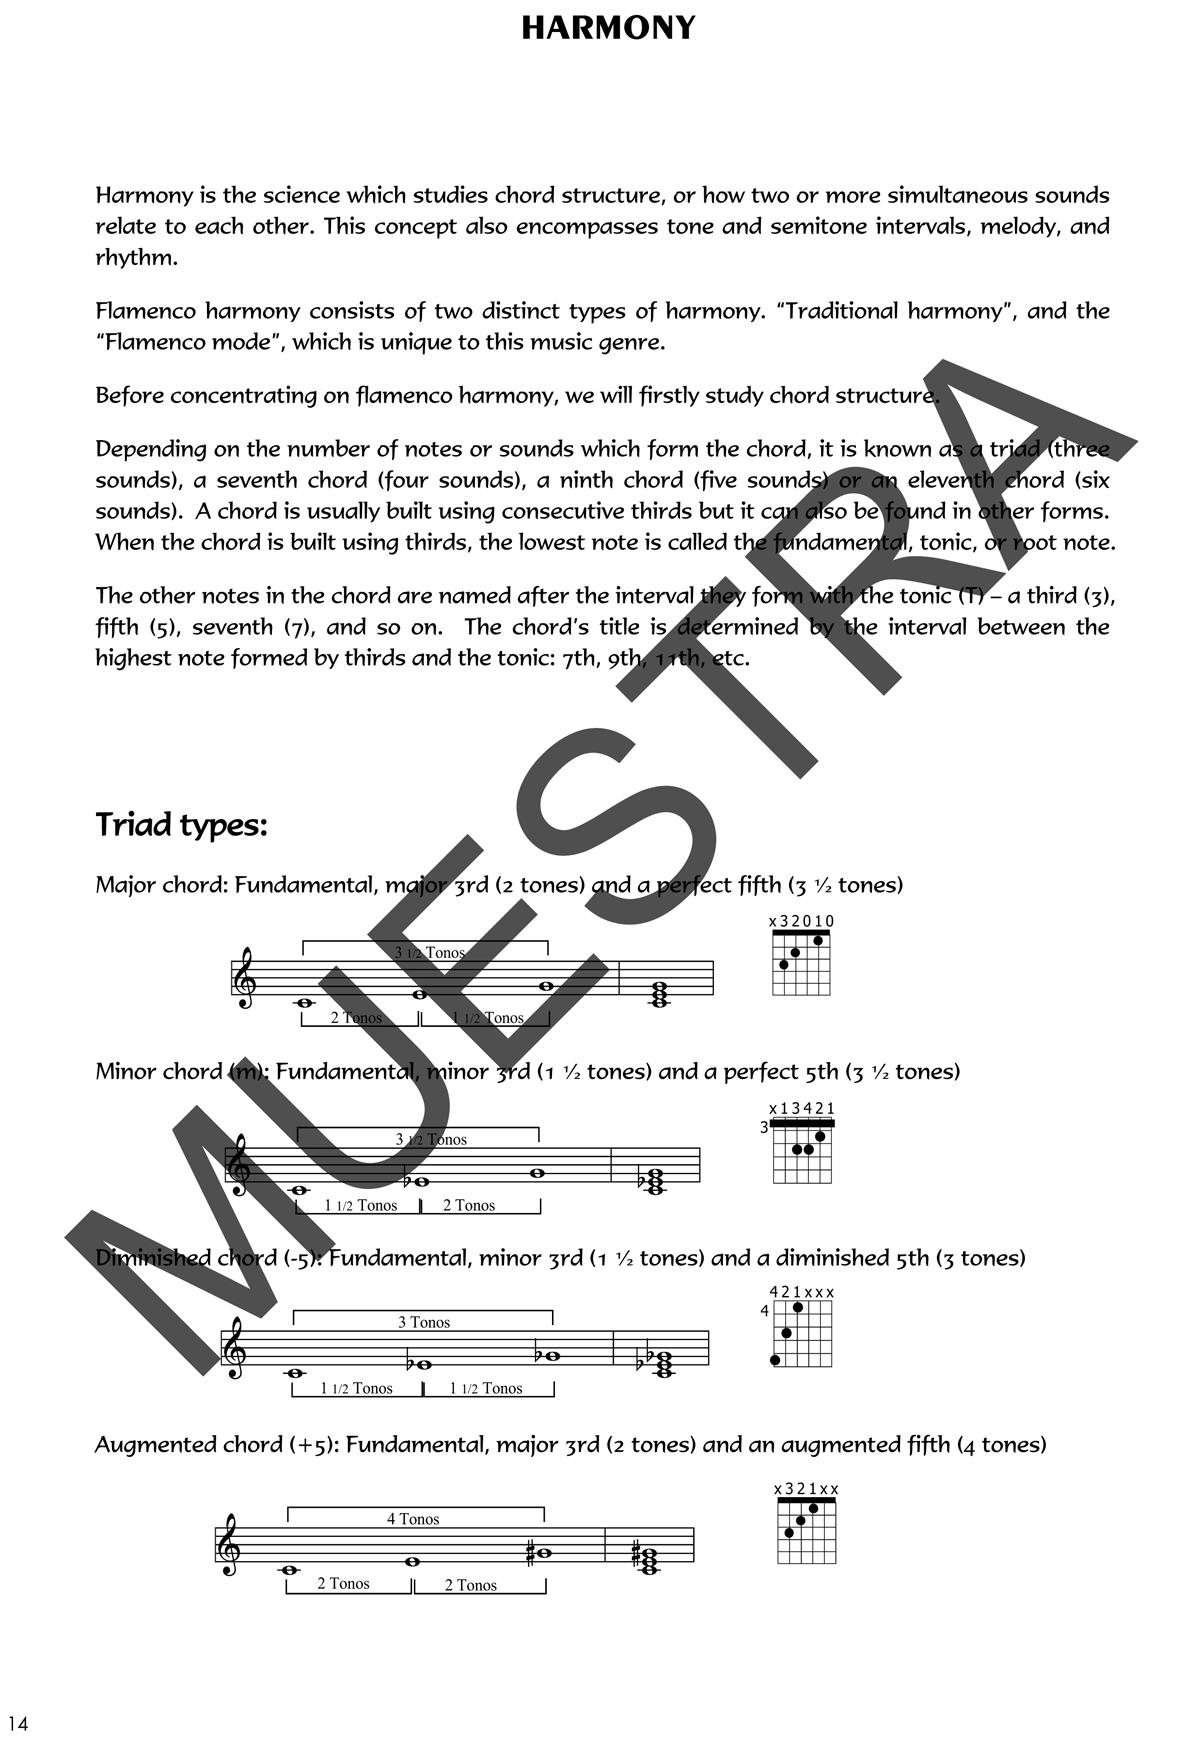 Learn Flamenco Guitar From The Rhythm 2 Sheet Music La Sonanta